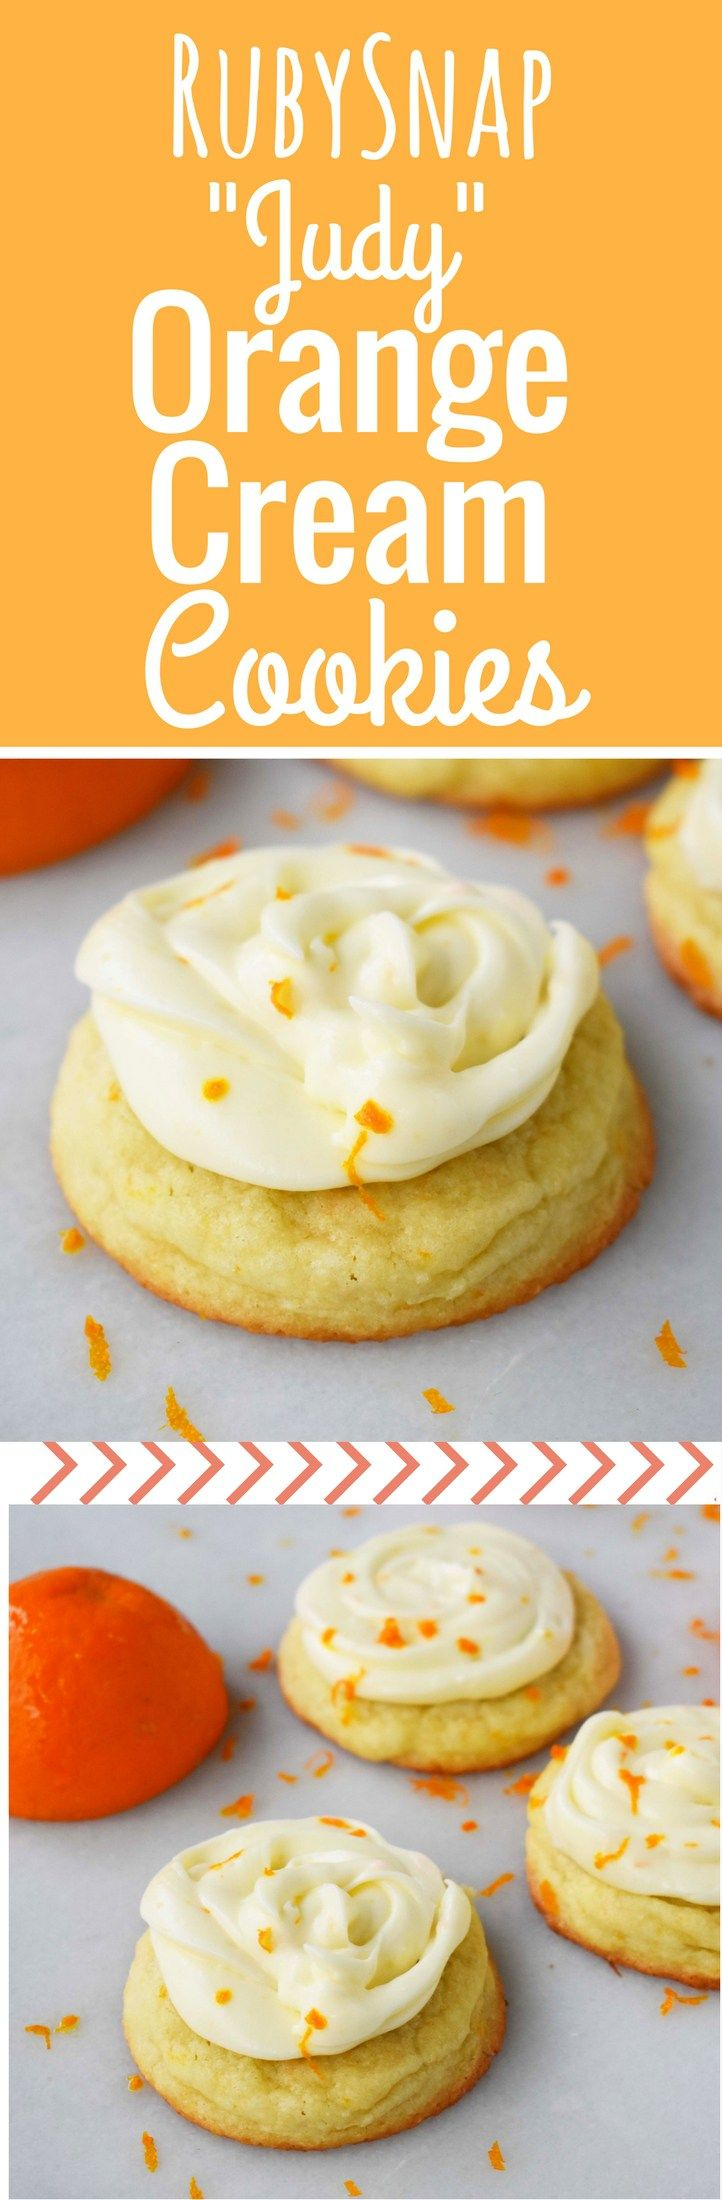 RubySnap Judy Orange Cream Cookies. Soft citrus orange dough cookie topped with sweet orange cream cheese frosting. An orange cream lovers dream cookie! www.modernhoney.com